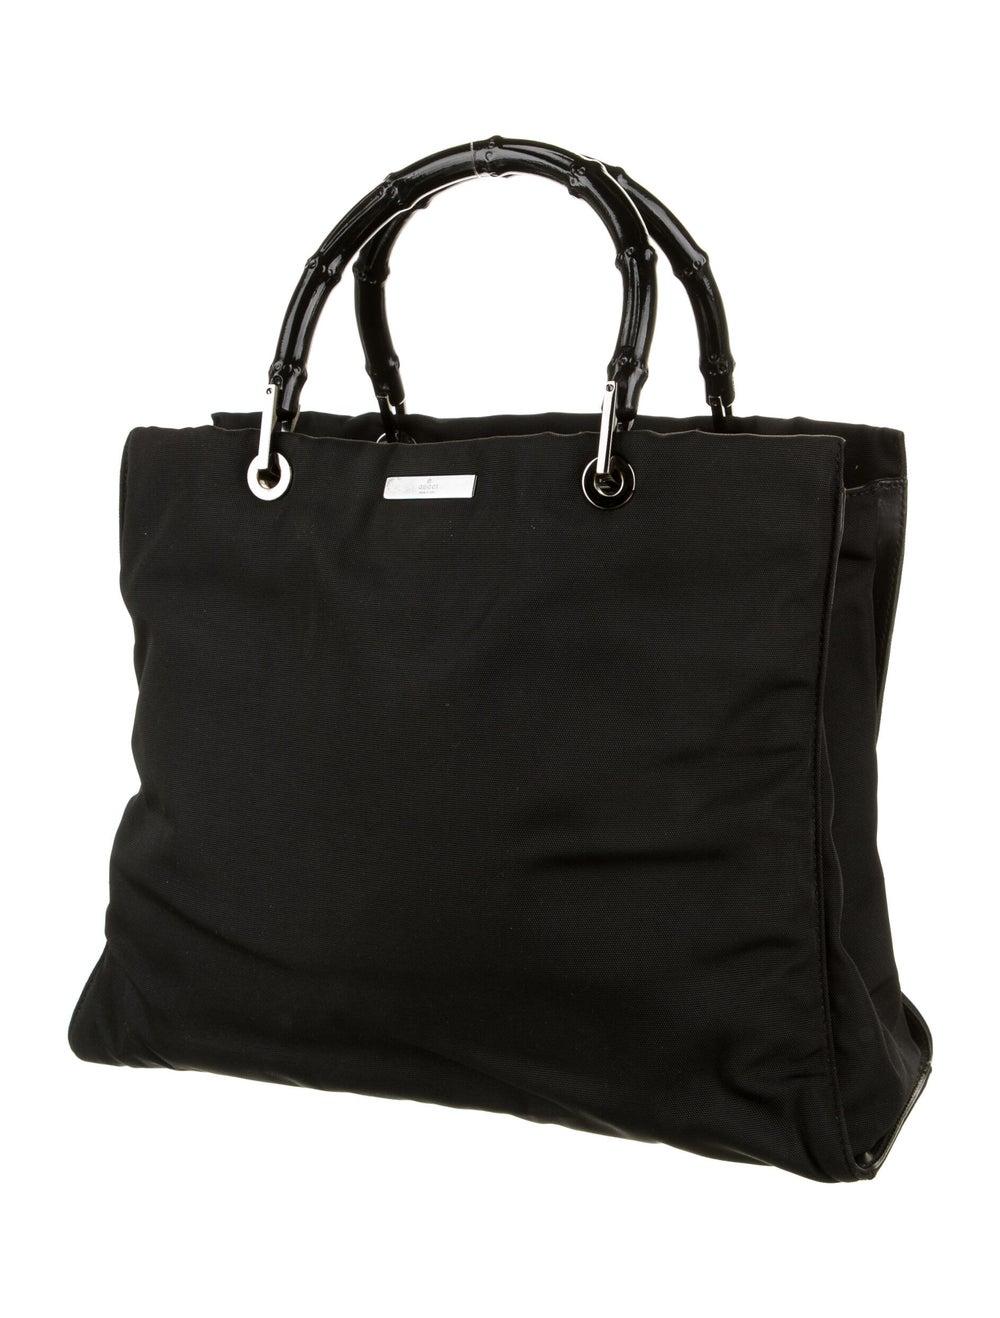 Gucci Nylon Bamboo Top Handle Bag Black - image 3